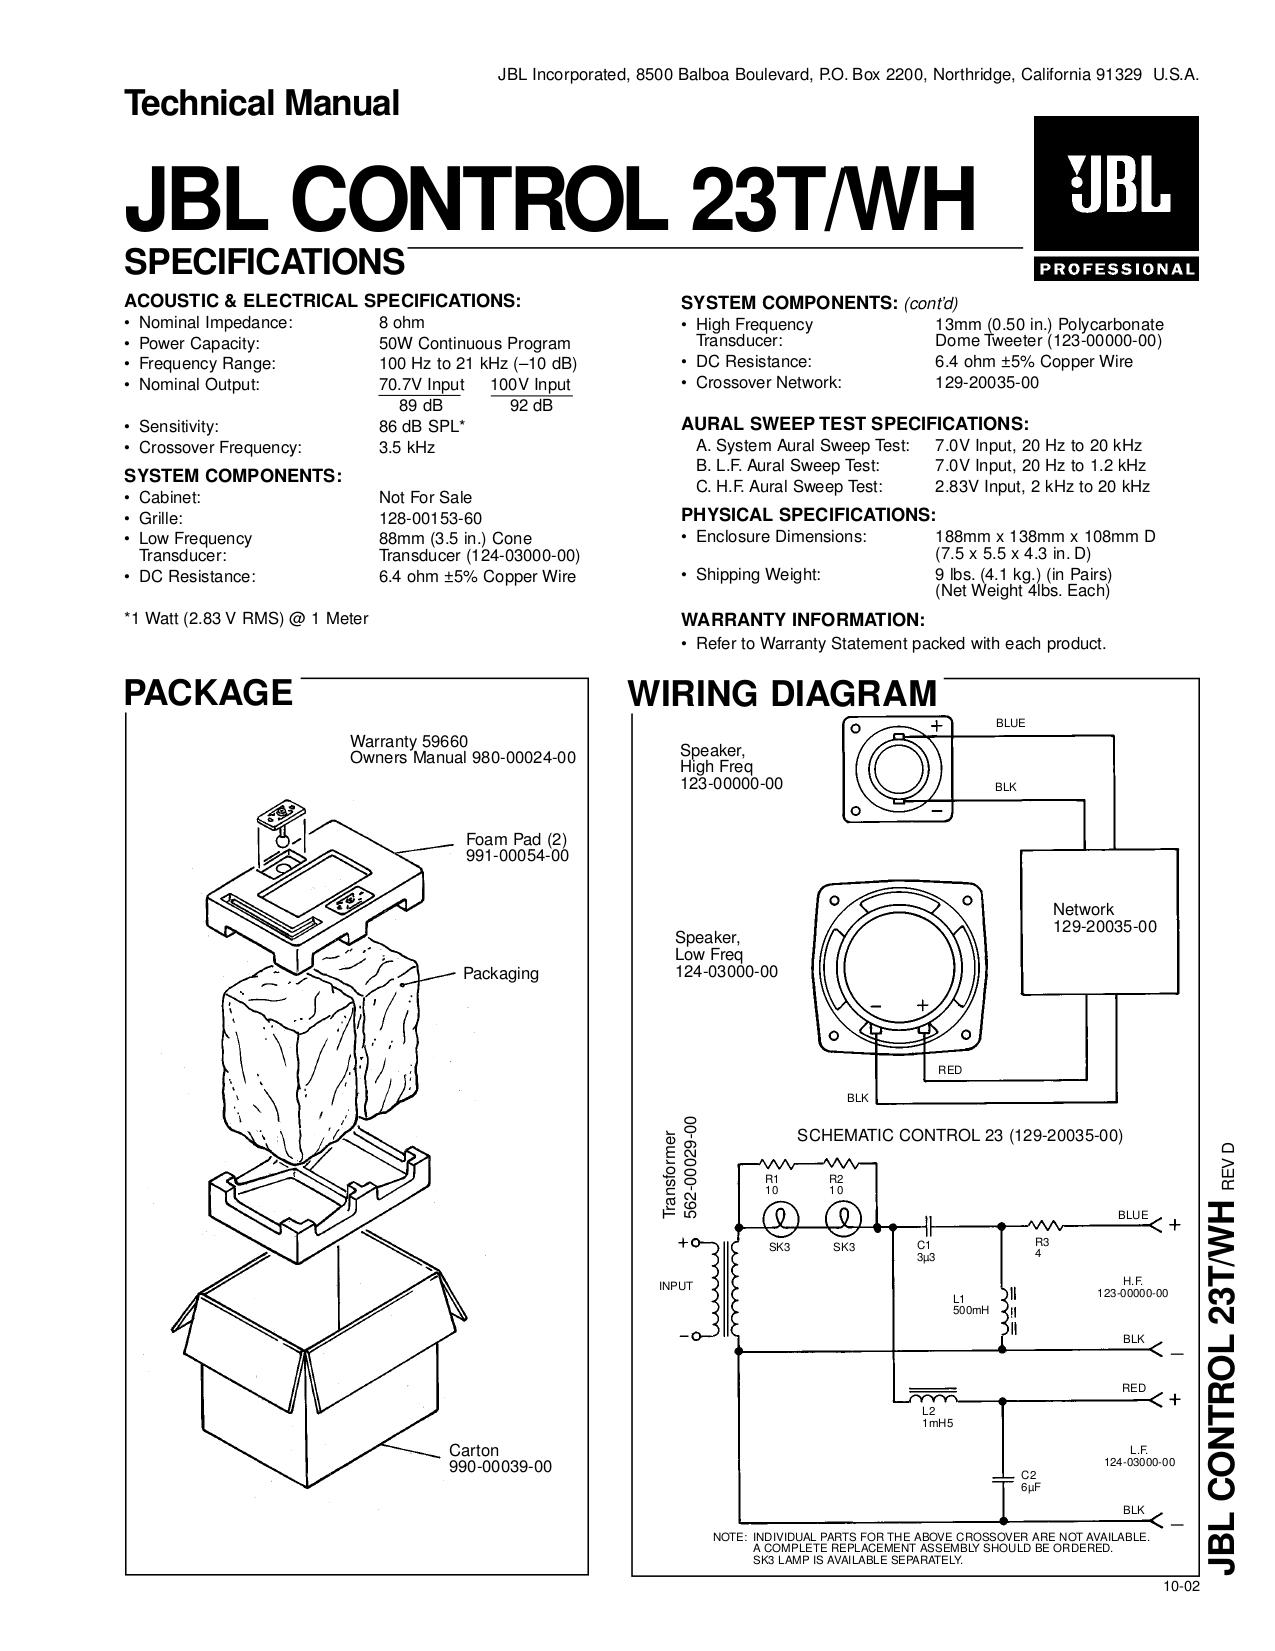 jbl eon wiring diagram jbl century l100 wiring diagram. Black Bedroom Furniture Sets. Home Design Ideas